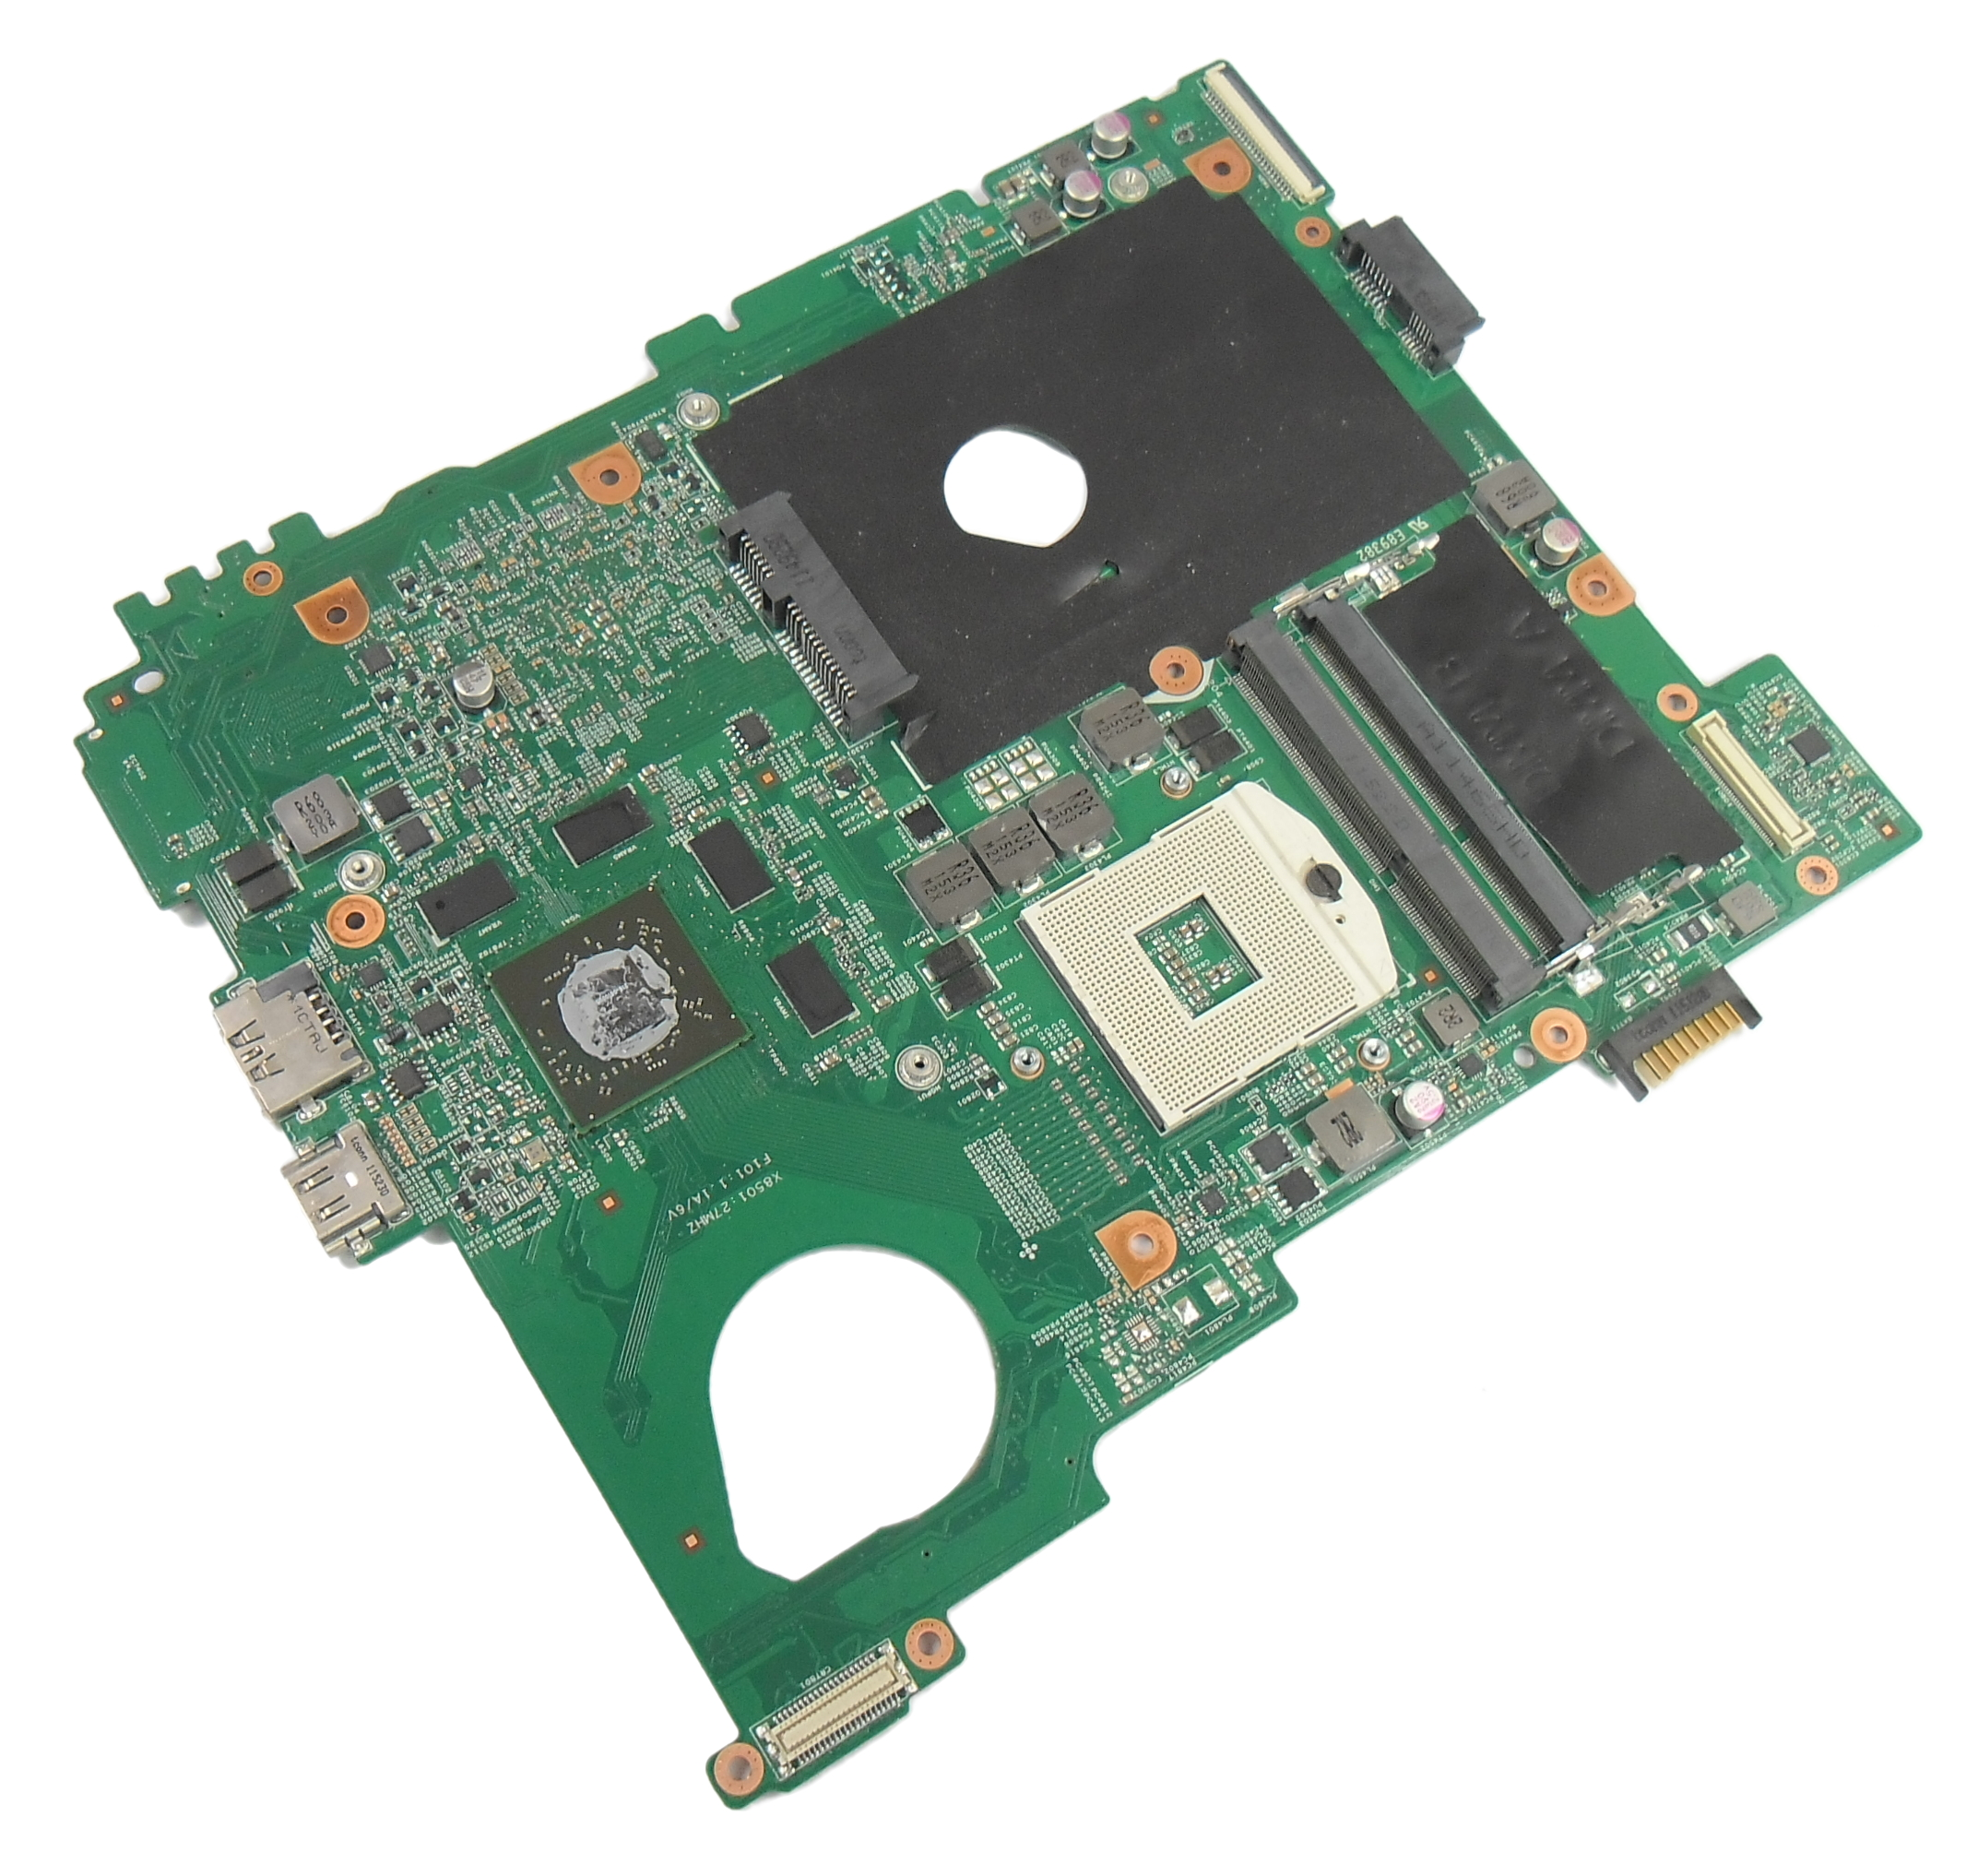 XV36V Dell Vostro 3550 Notebook Motherboard